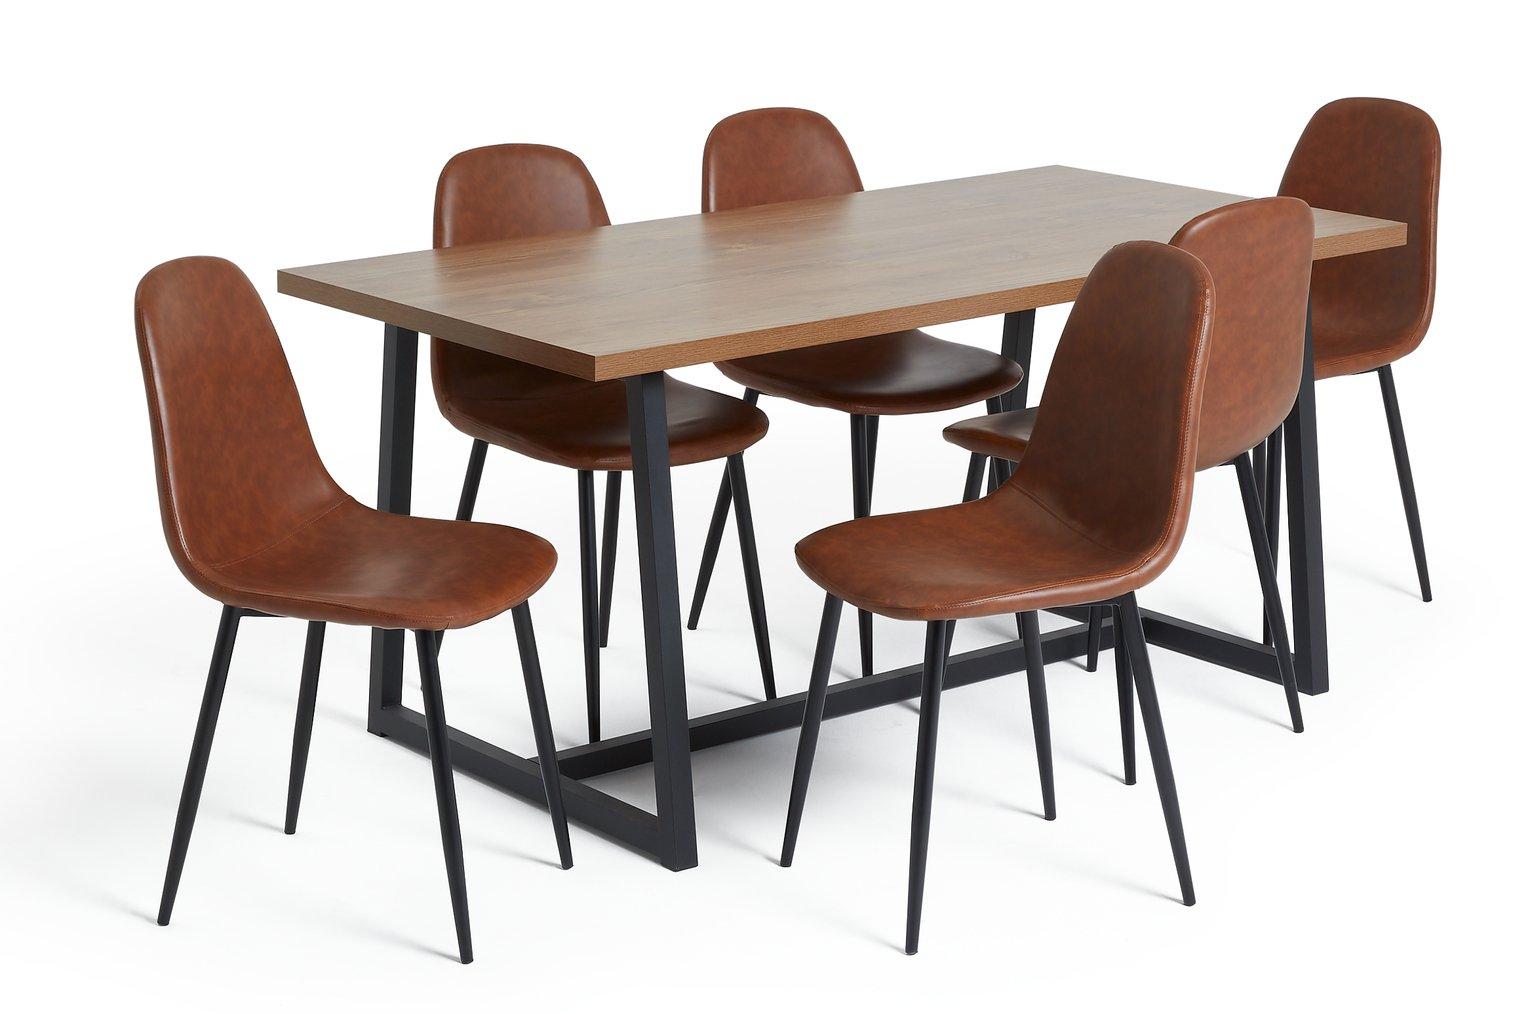 Habitat Nomad Oak Dining Table and 6 Beni Tan Chairs